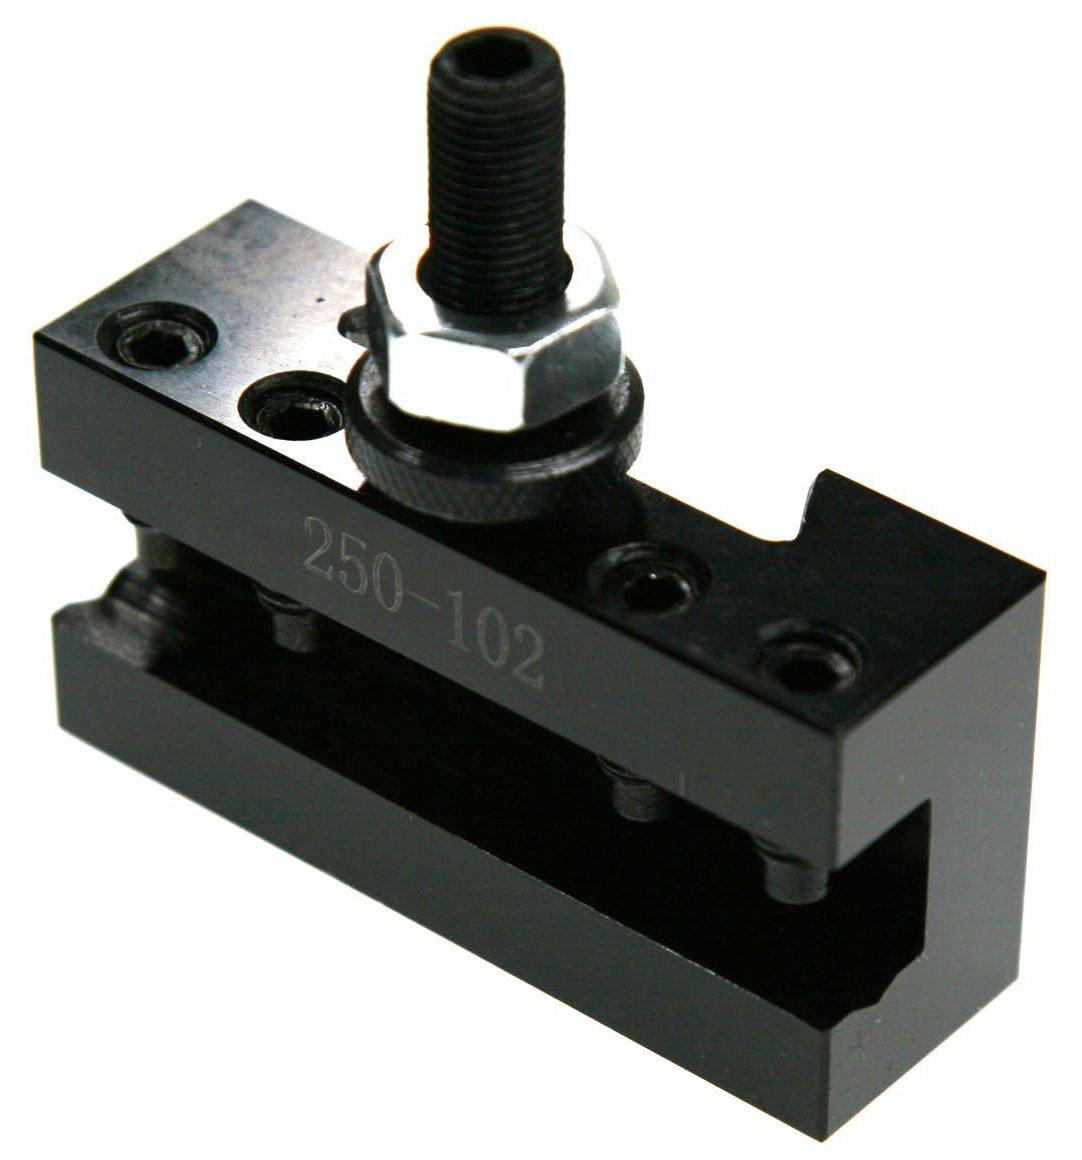 6-12'' AXA Quick Change CNC Tool Post Turning Facing Holder 1# 250-101 and Boring Turning Holder 250-102#2 Set